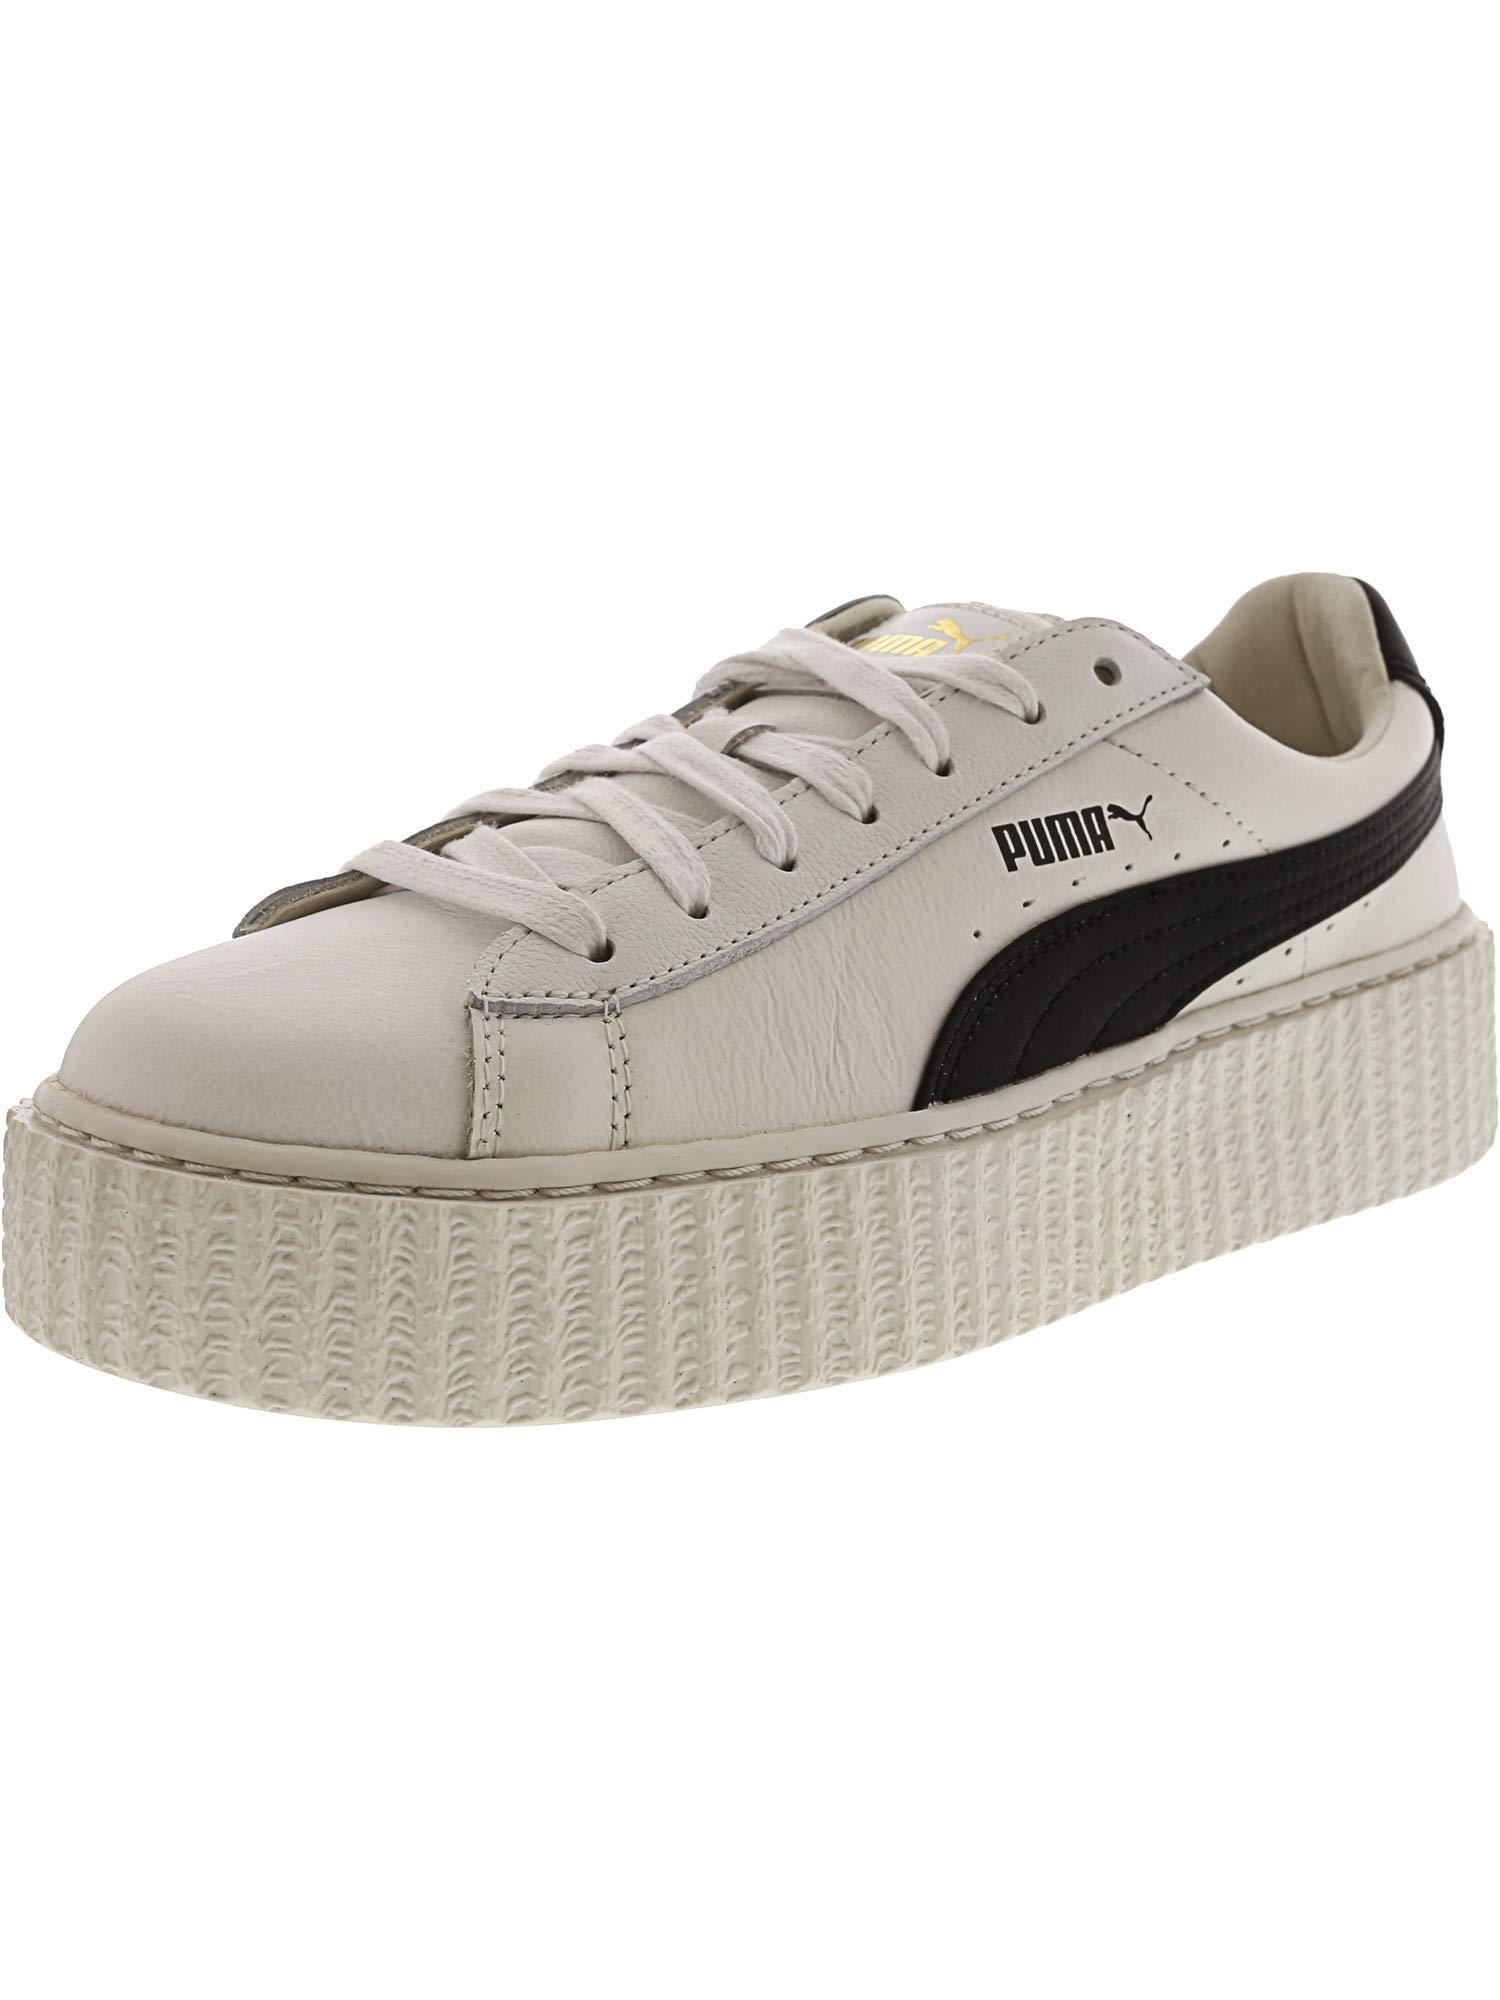 Puma Creeper White & Black - 364462 01 by PUMA